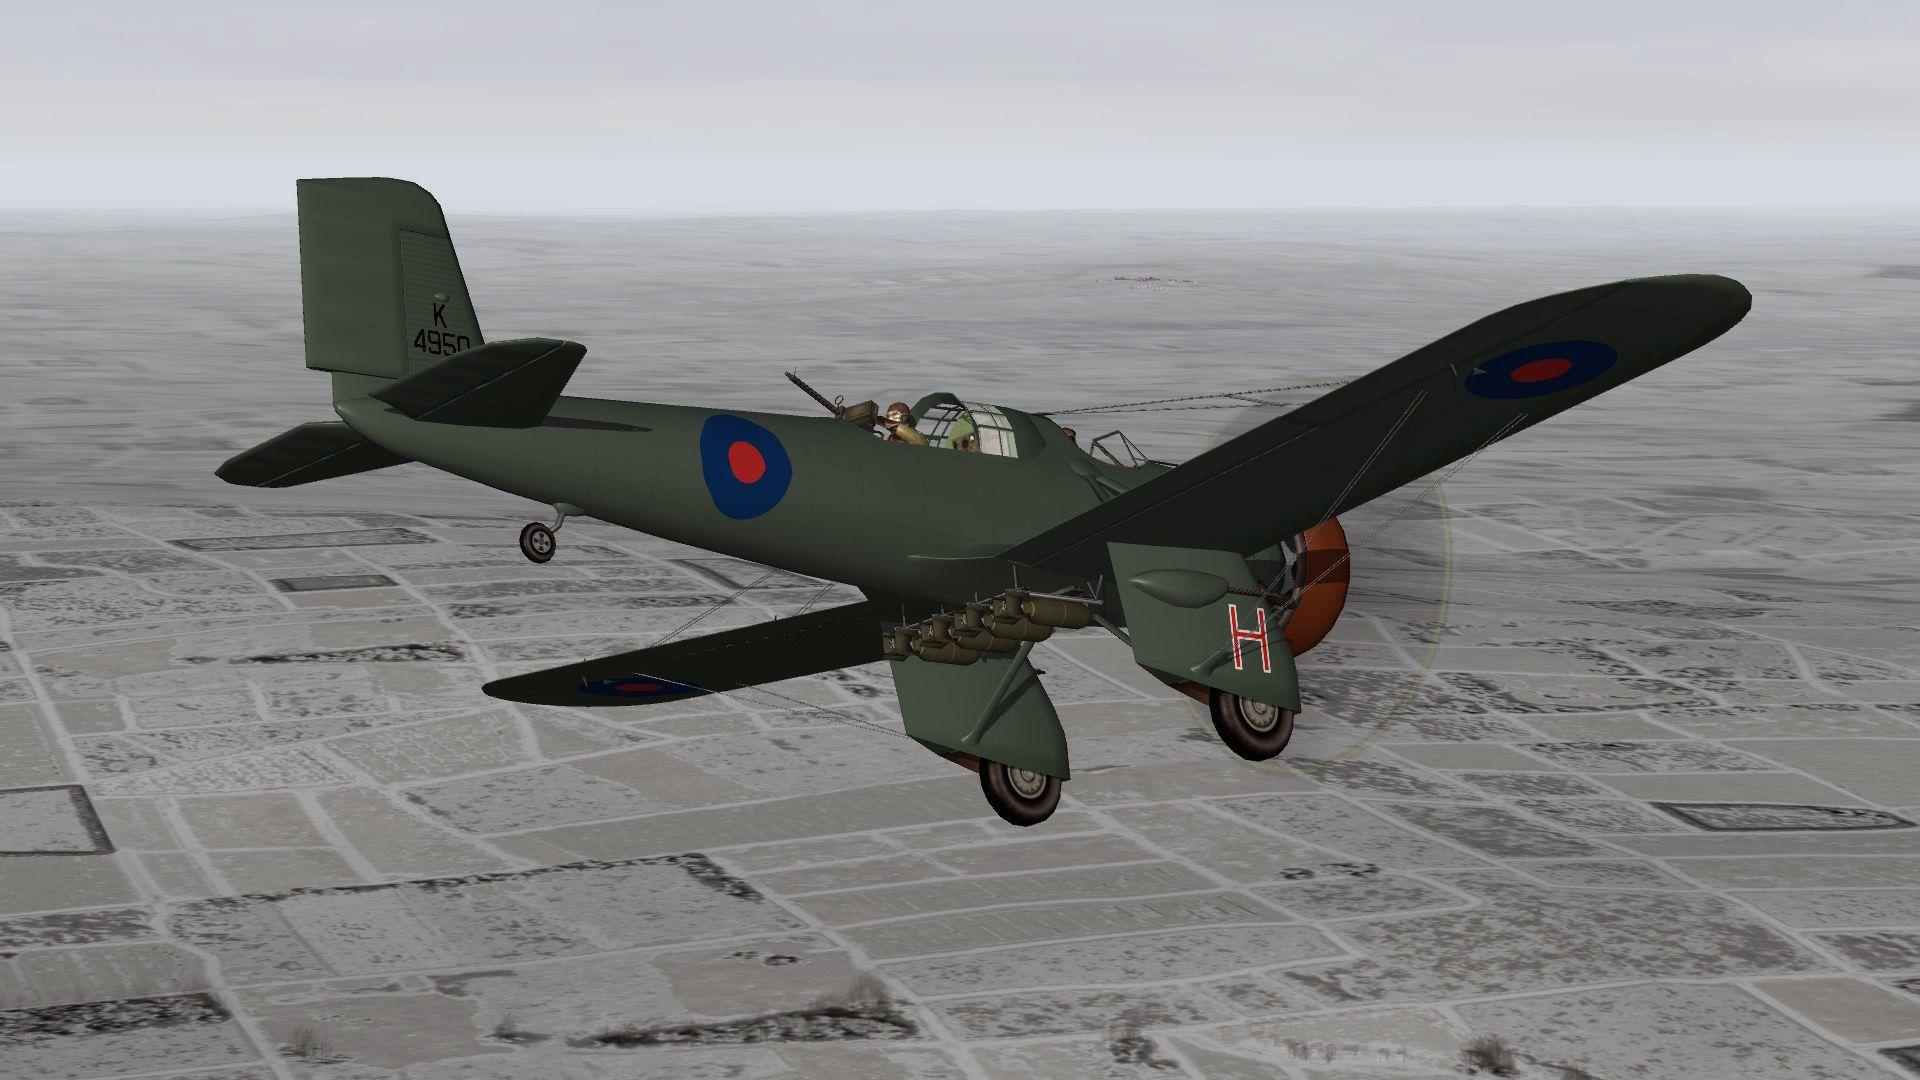 RAF%20VEDETTE%20B1.06_zpsdtxip6ia.jpg